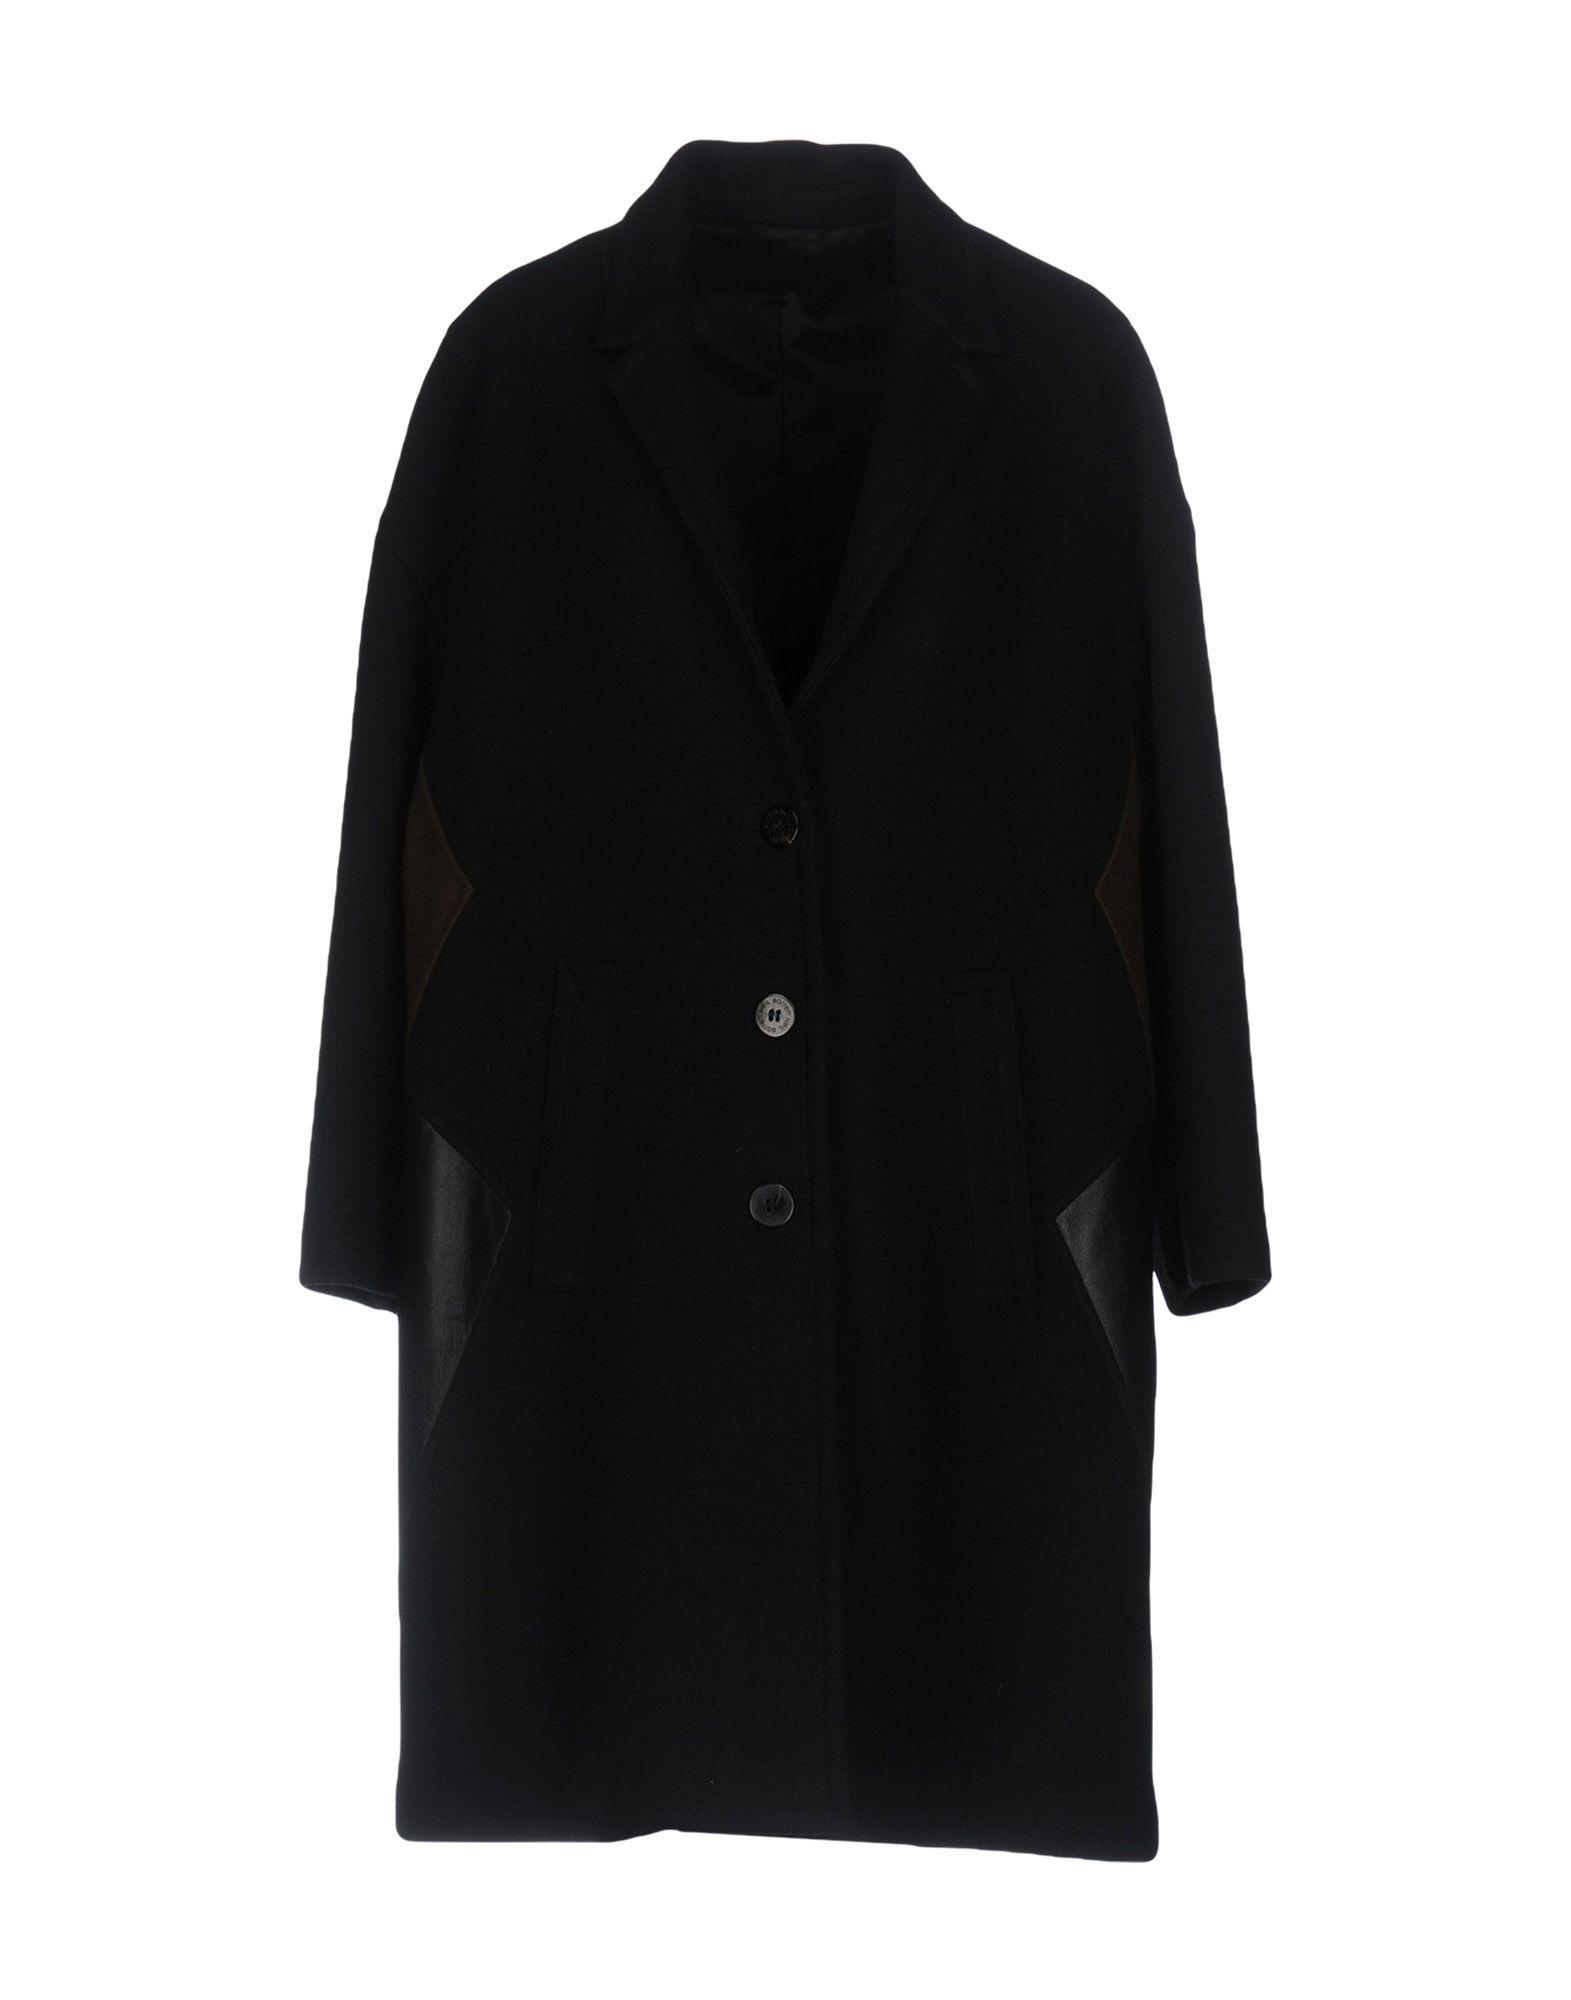 NEIL BARRETT Пальто пальто зима кожаные рукава цена